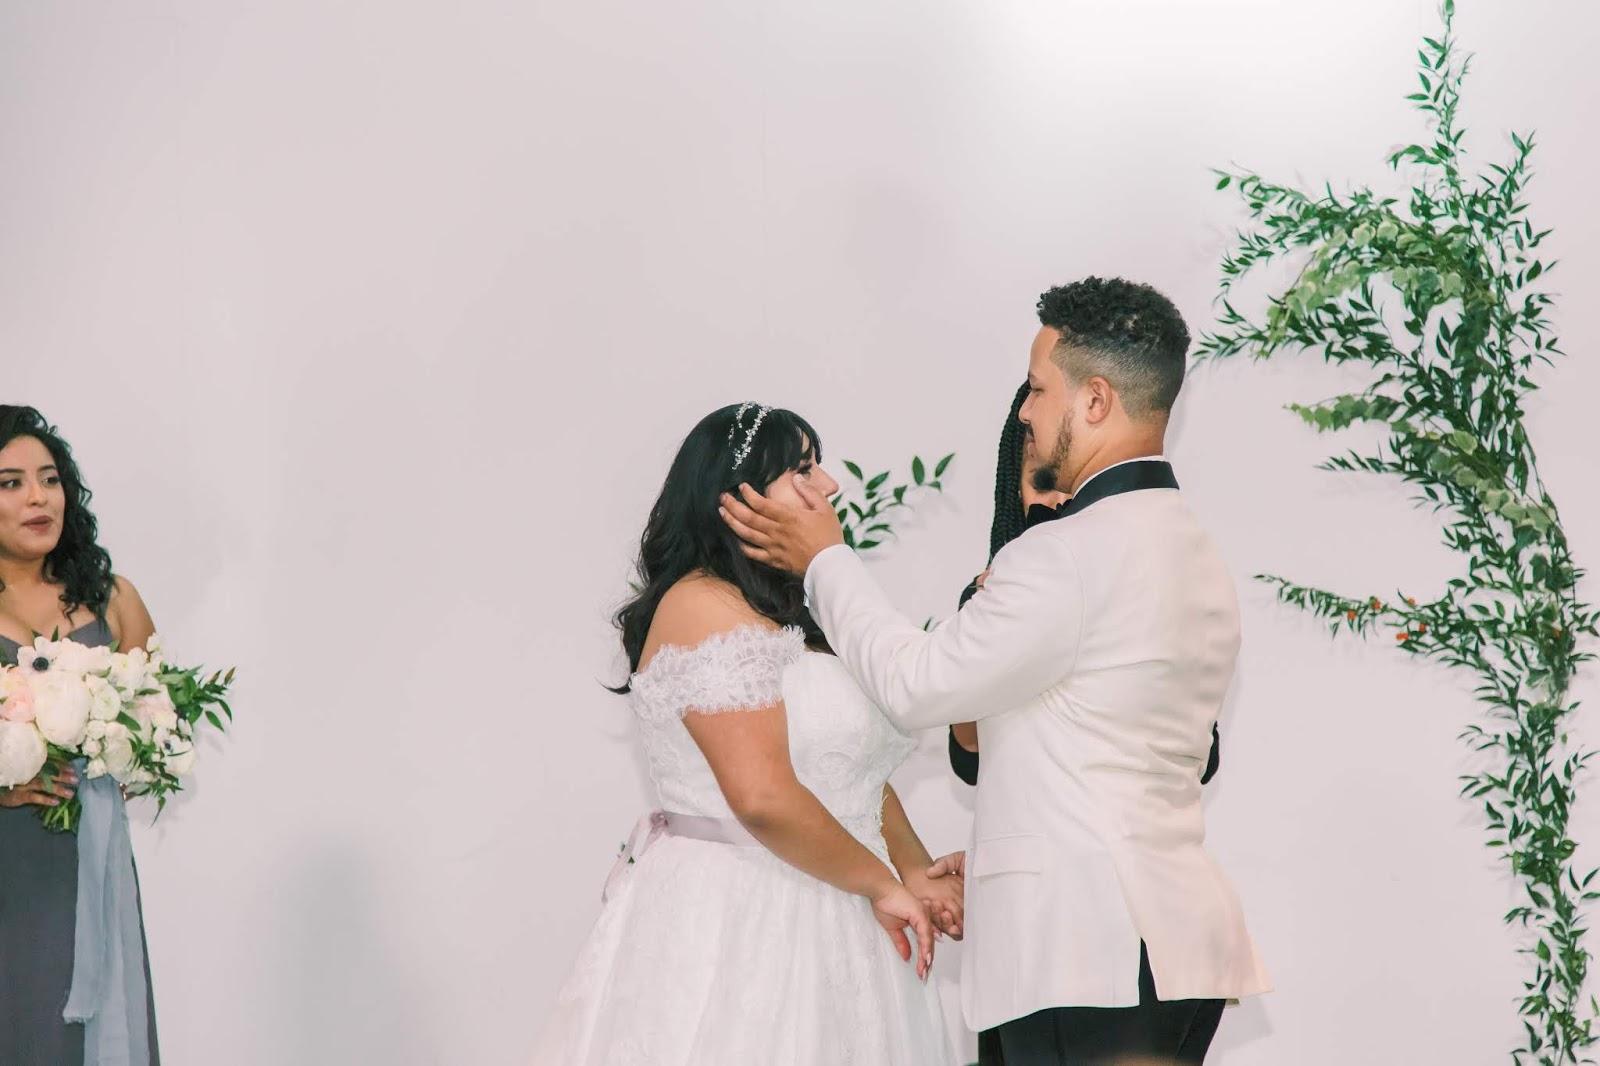 las vegas wedding,african american officiant, latina bride